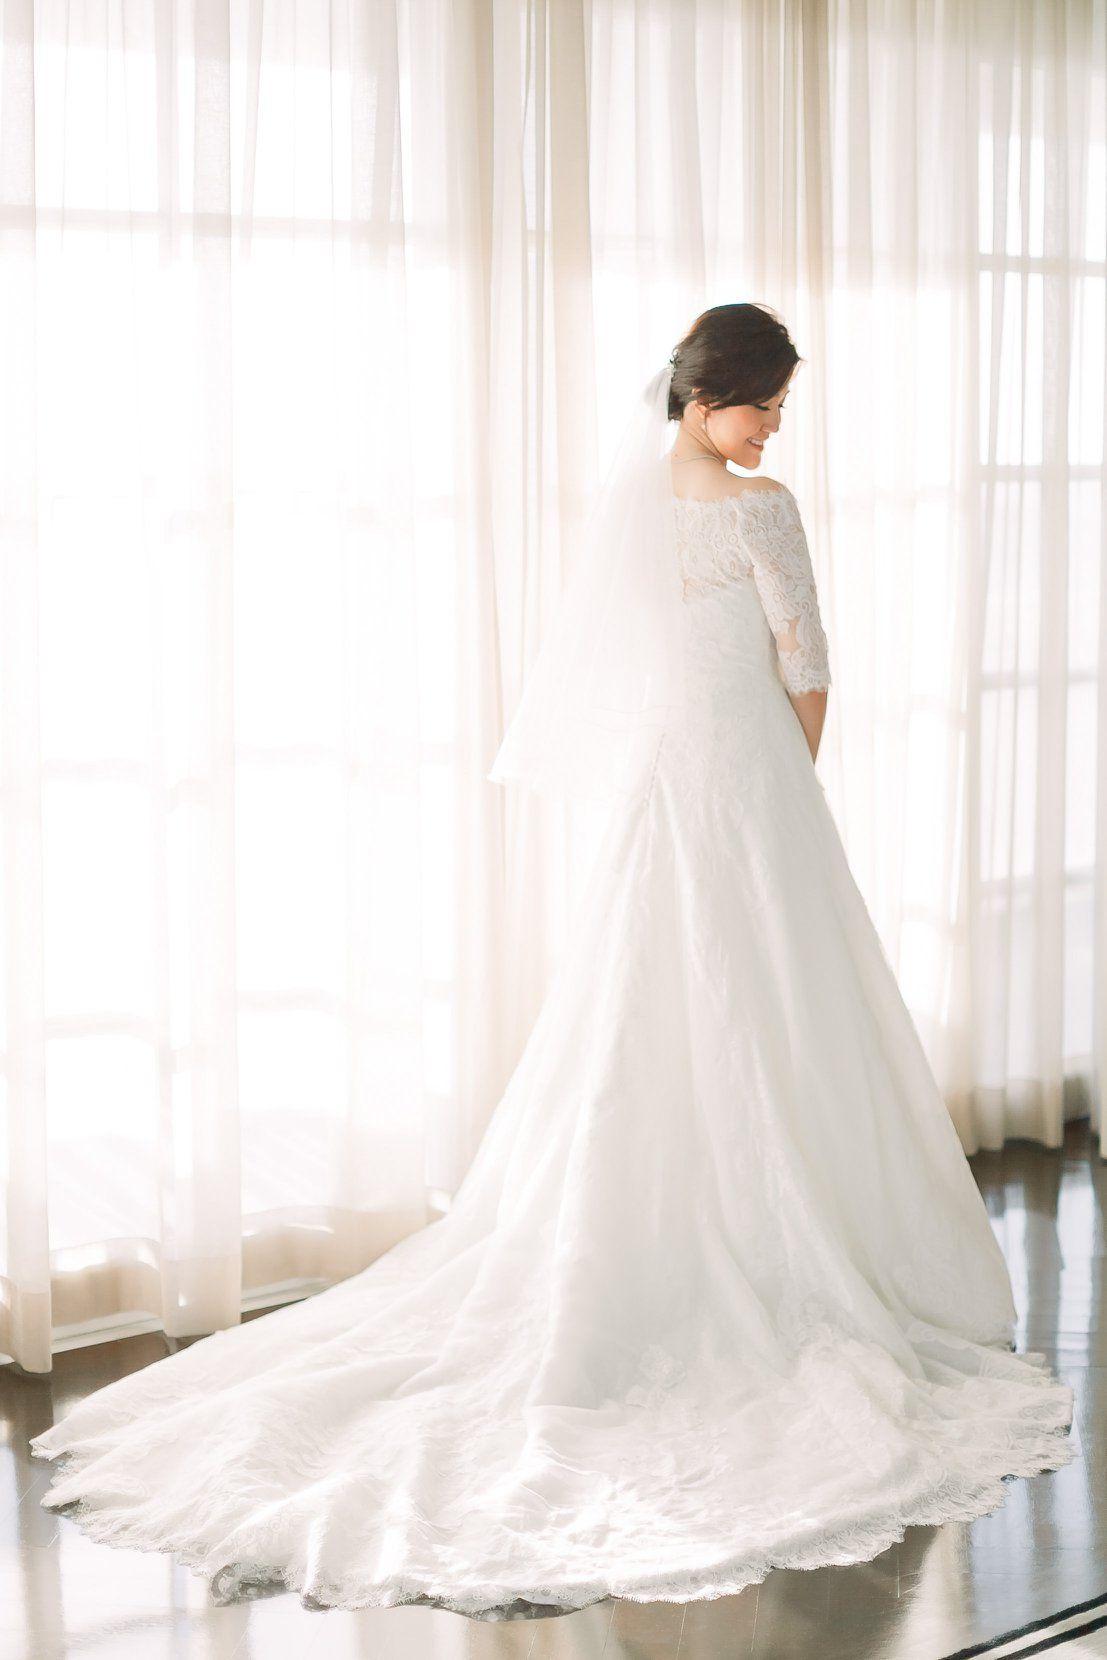 Pronovias 2020 Wedding Dresses Bridal Gowns Kl Pronovias Bridal Timeless Wedding Dress Bridal Gowns